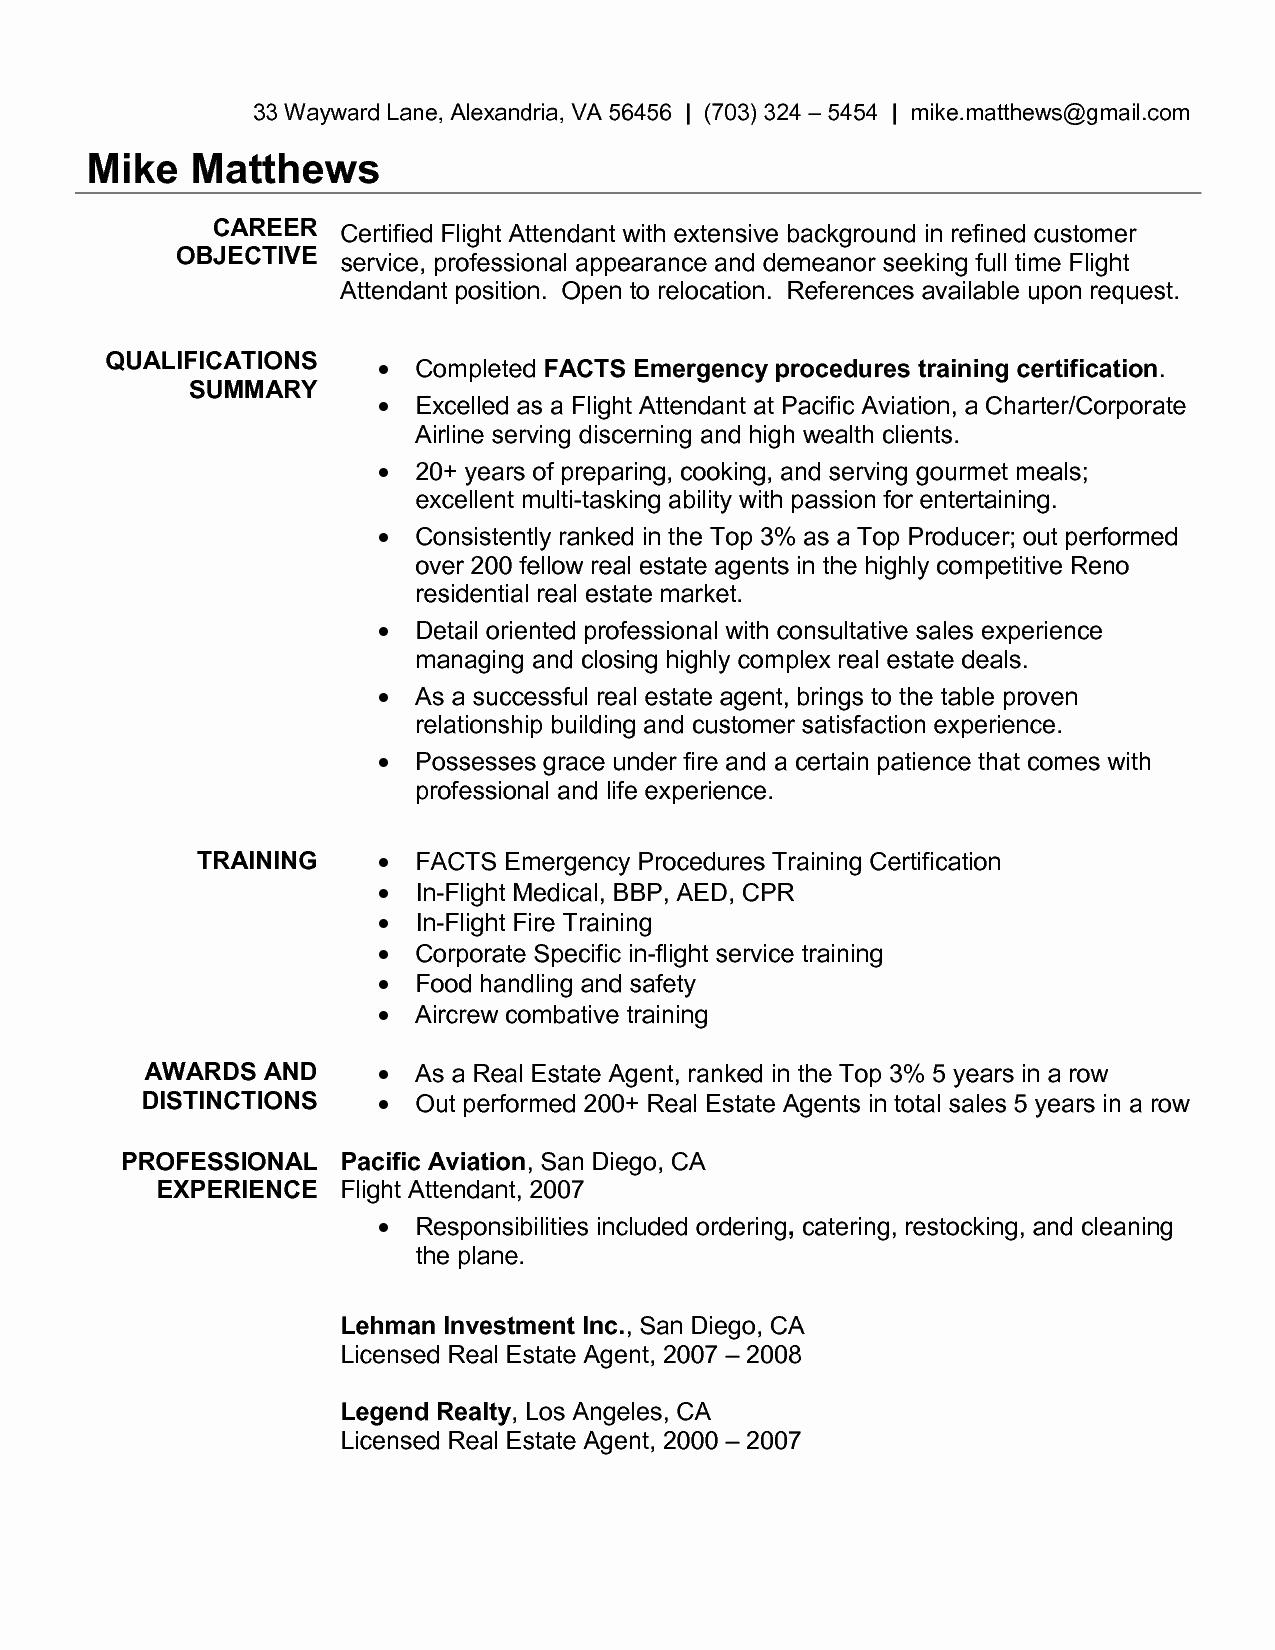 Cool Corporate Flight attendant Resume Best Template